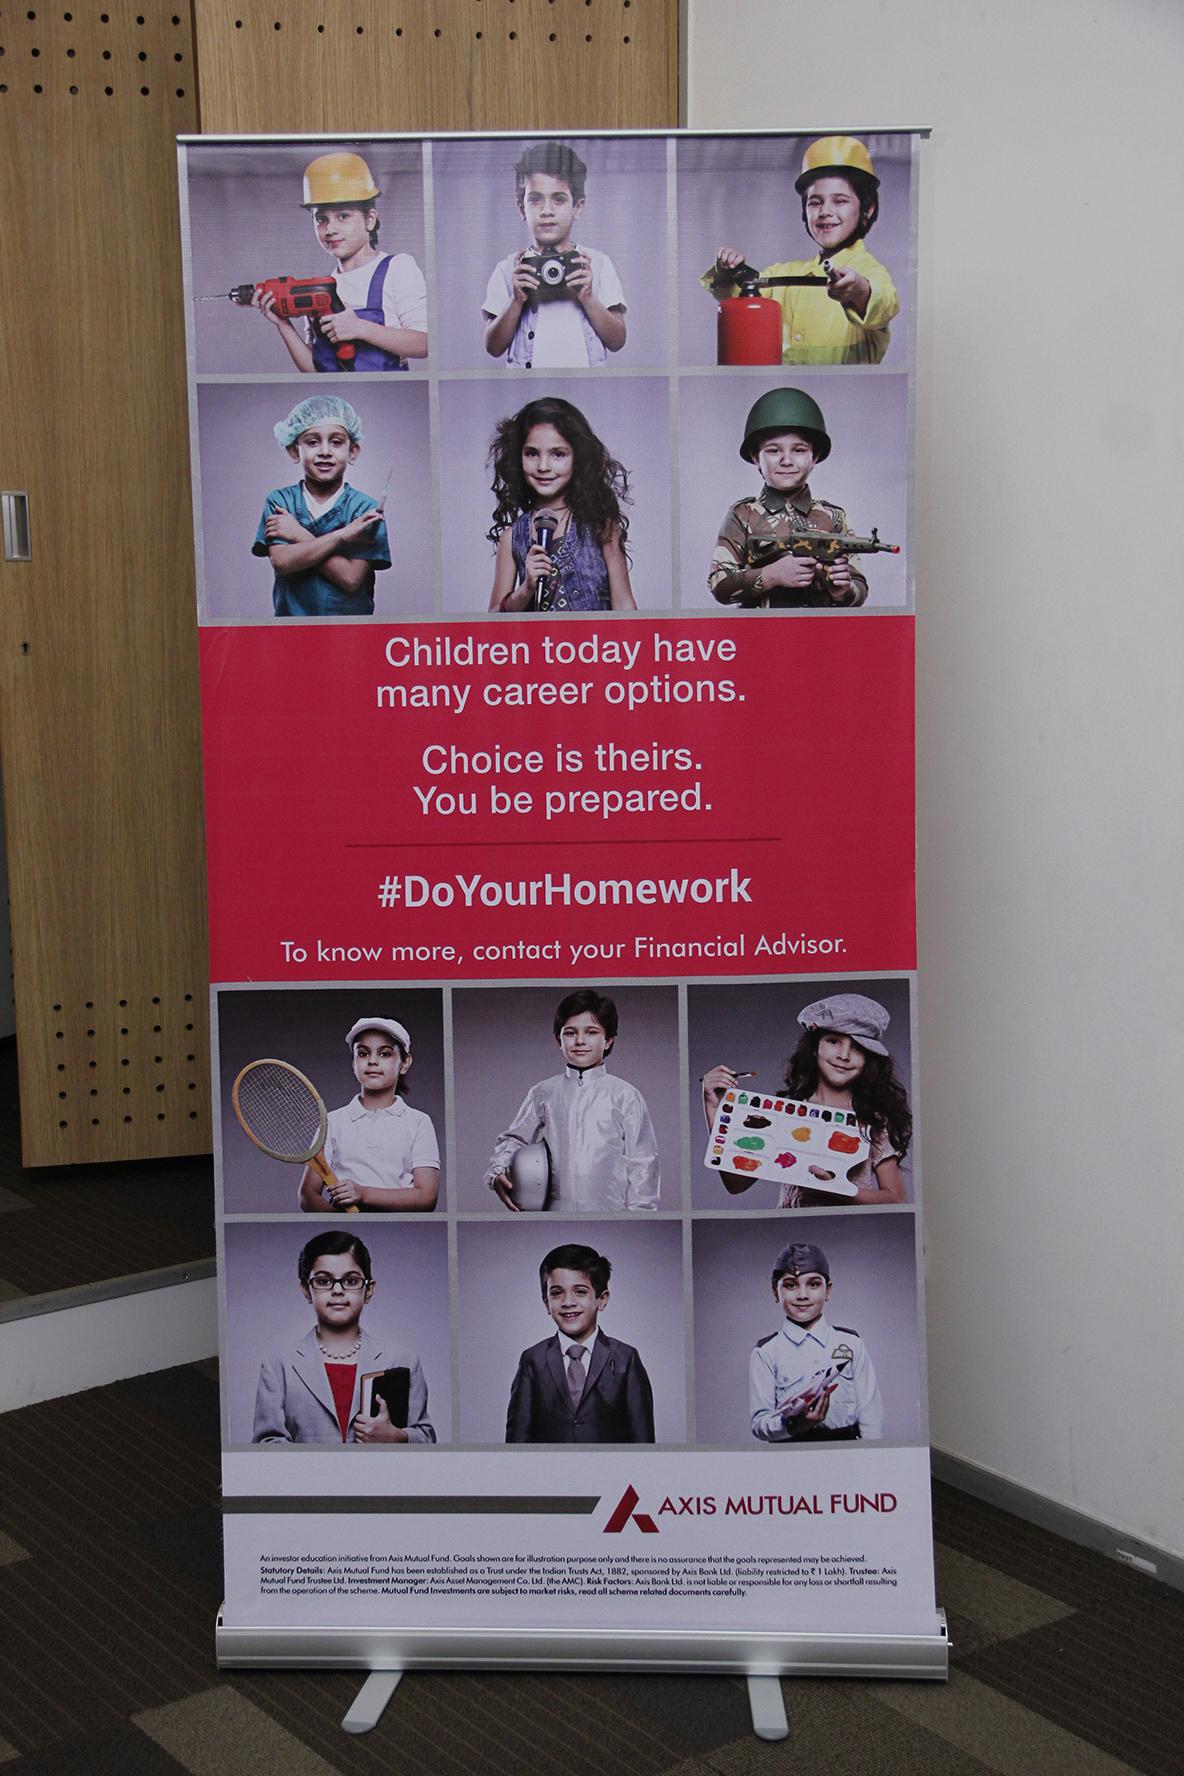 Who tells Parents to #DoYourHomework?